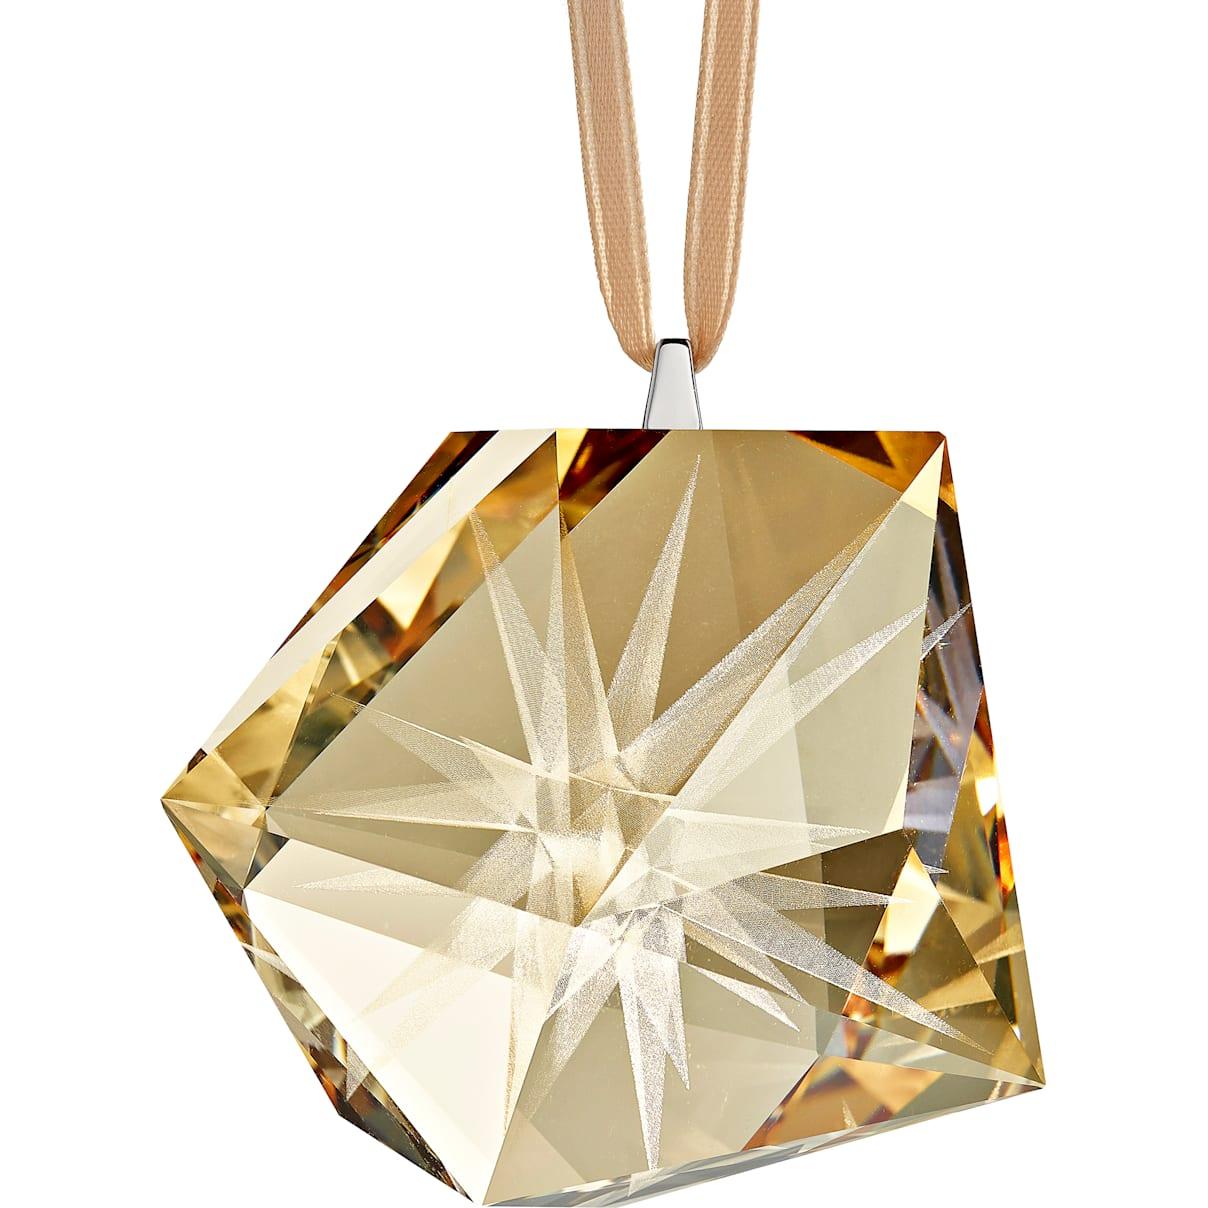 Swarovski Daniel Libeskind Frosted Star Ornament, Golden